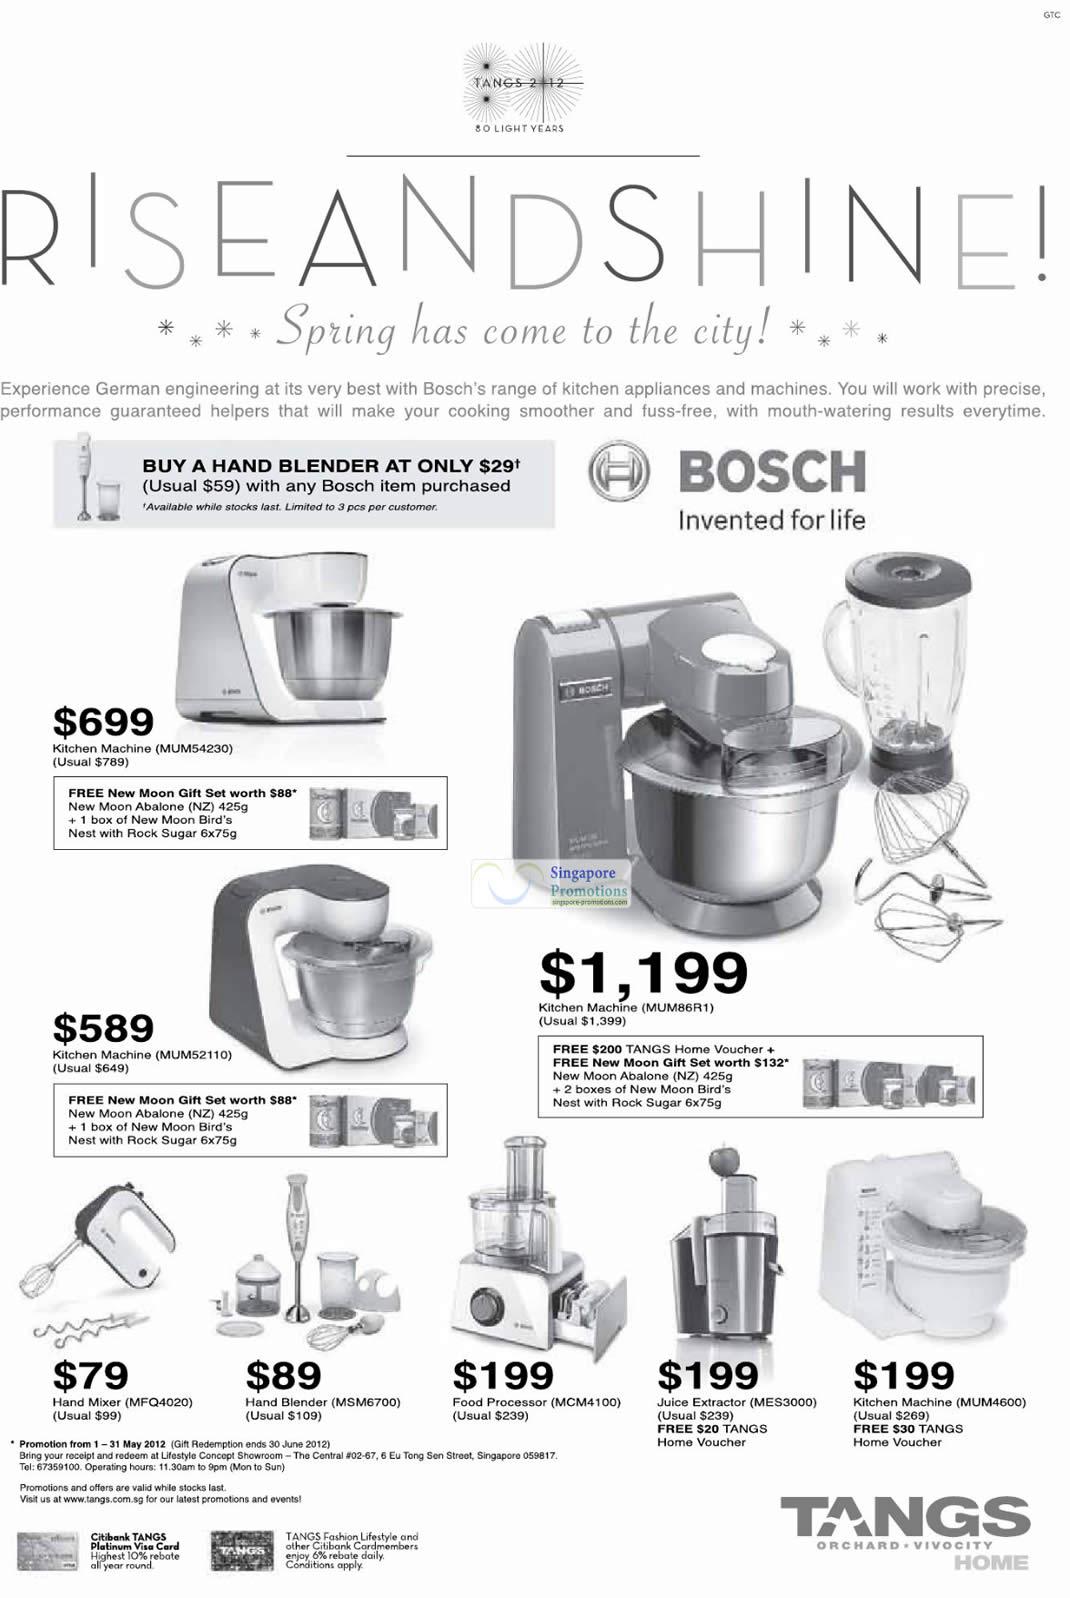 Bosch Kitchen Machine MUM54230, Bosch Kitchen Machine MUM52110, Bosch Hand Mixer MFQ4020, Bosch Hand Blender MSM6700, Bosch Food Processor MCM4100, Bosch Juice Extractor MES3000, Bosch Kitchen Machine MUM4600, Bosch Kitchen Machine MUM86R1